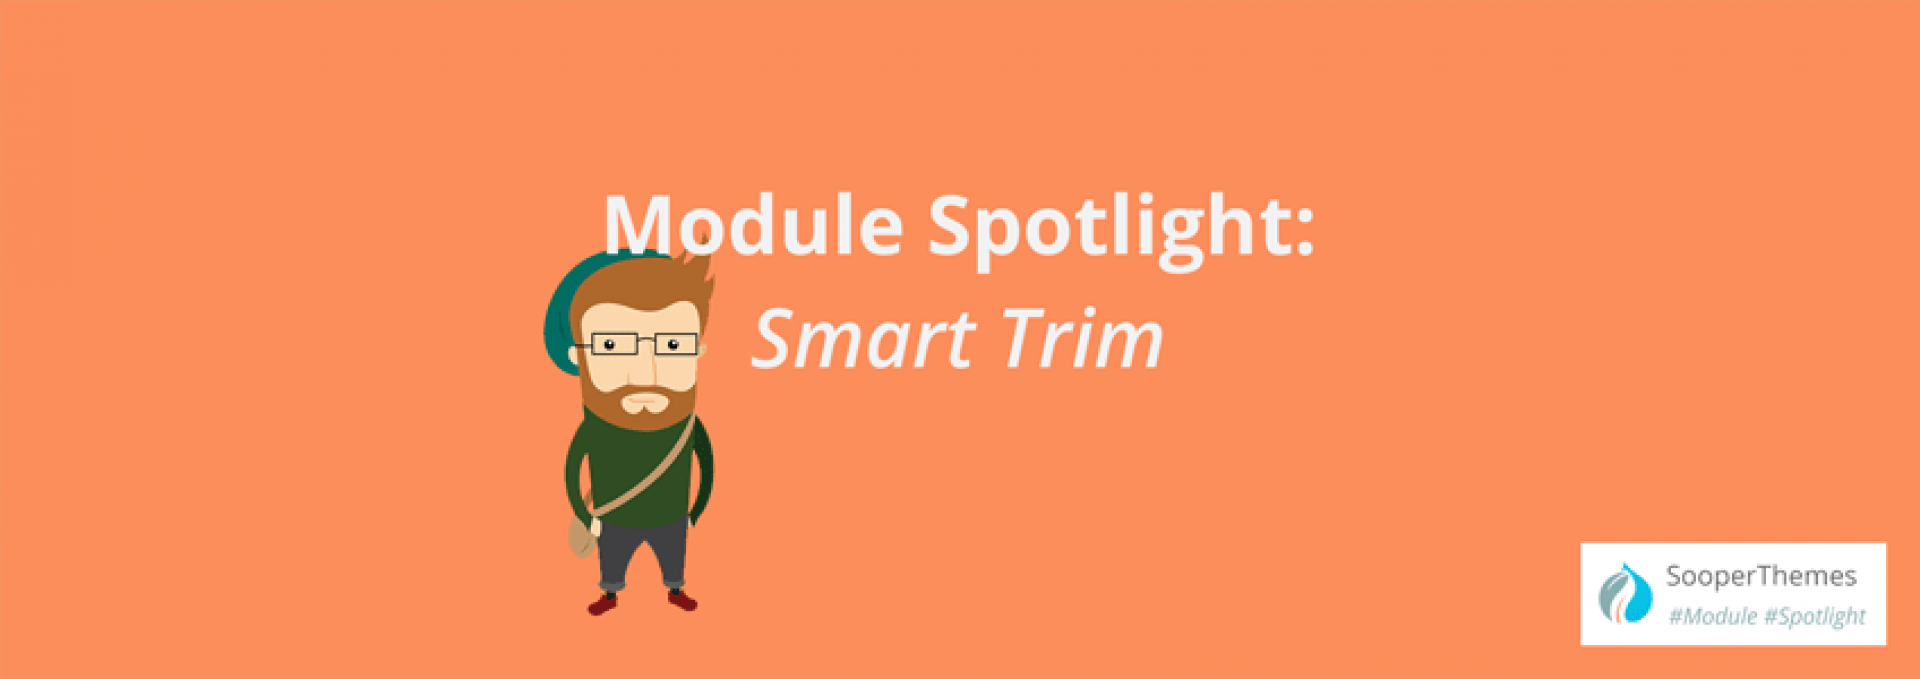 Module Spotlight #1: Smart Trim   Sooperthemes